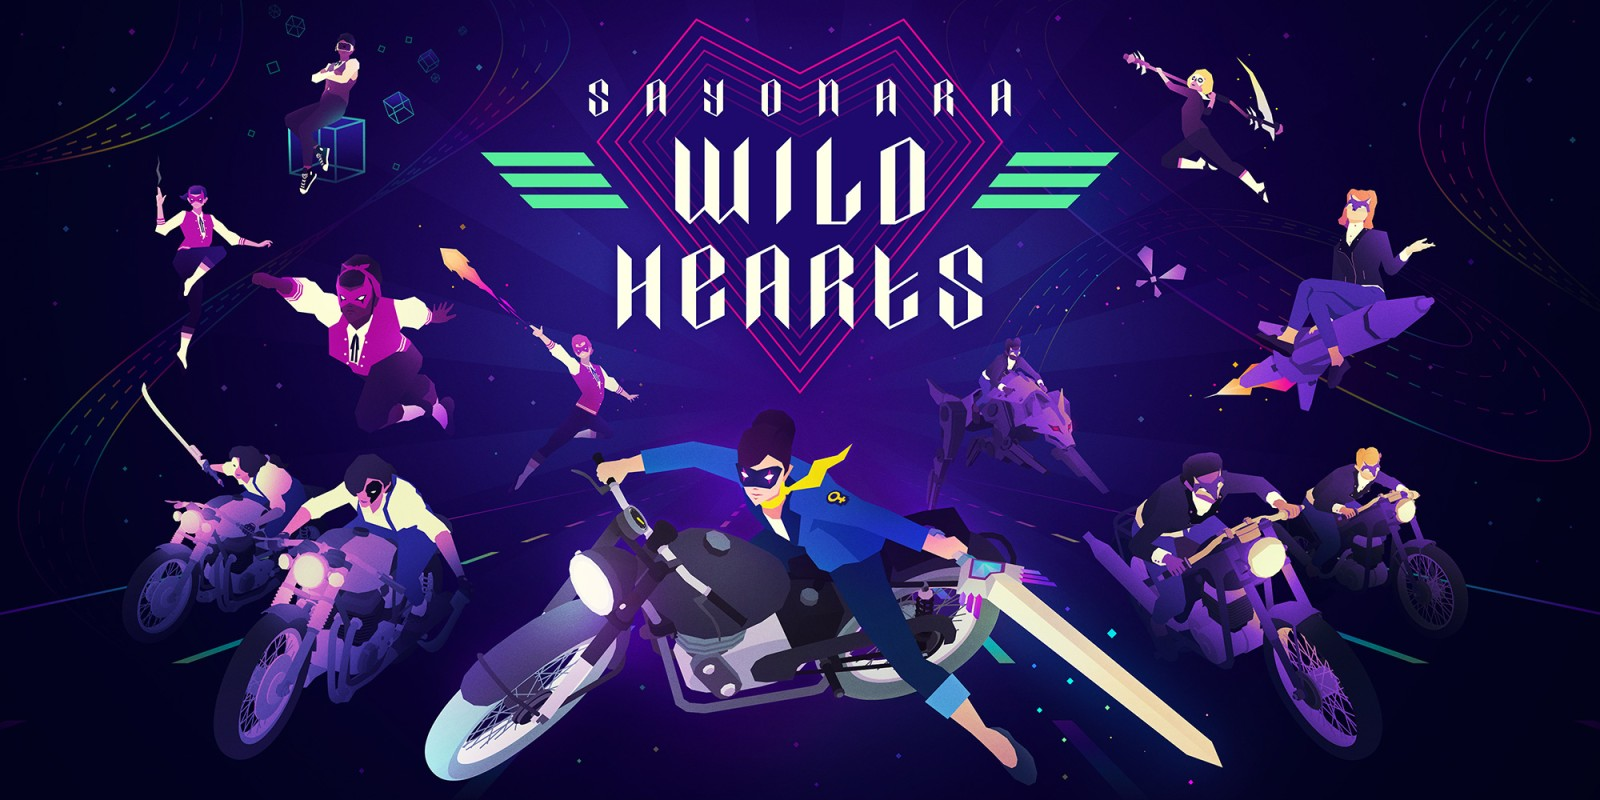 Картинки по запросу Sayonara Wild Hearts